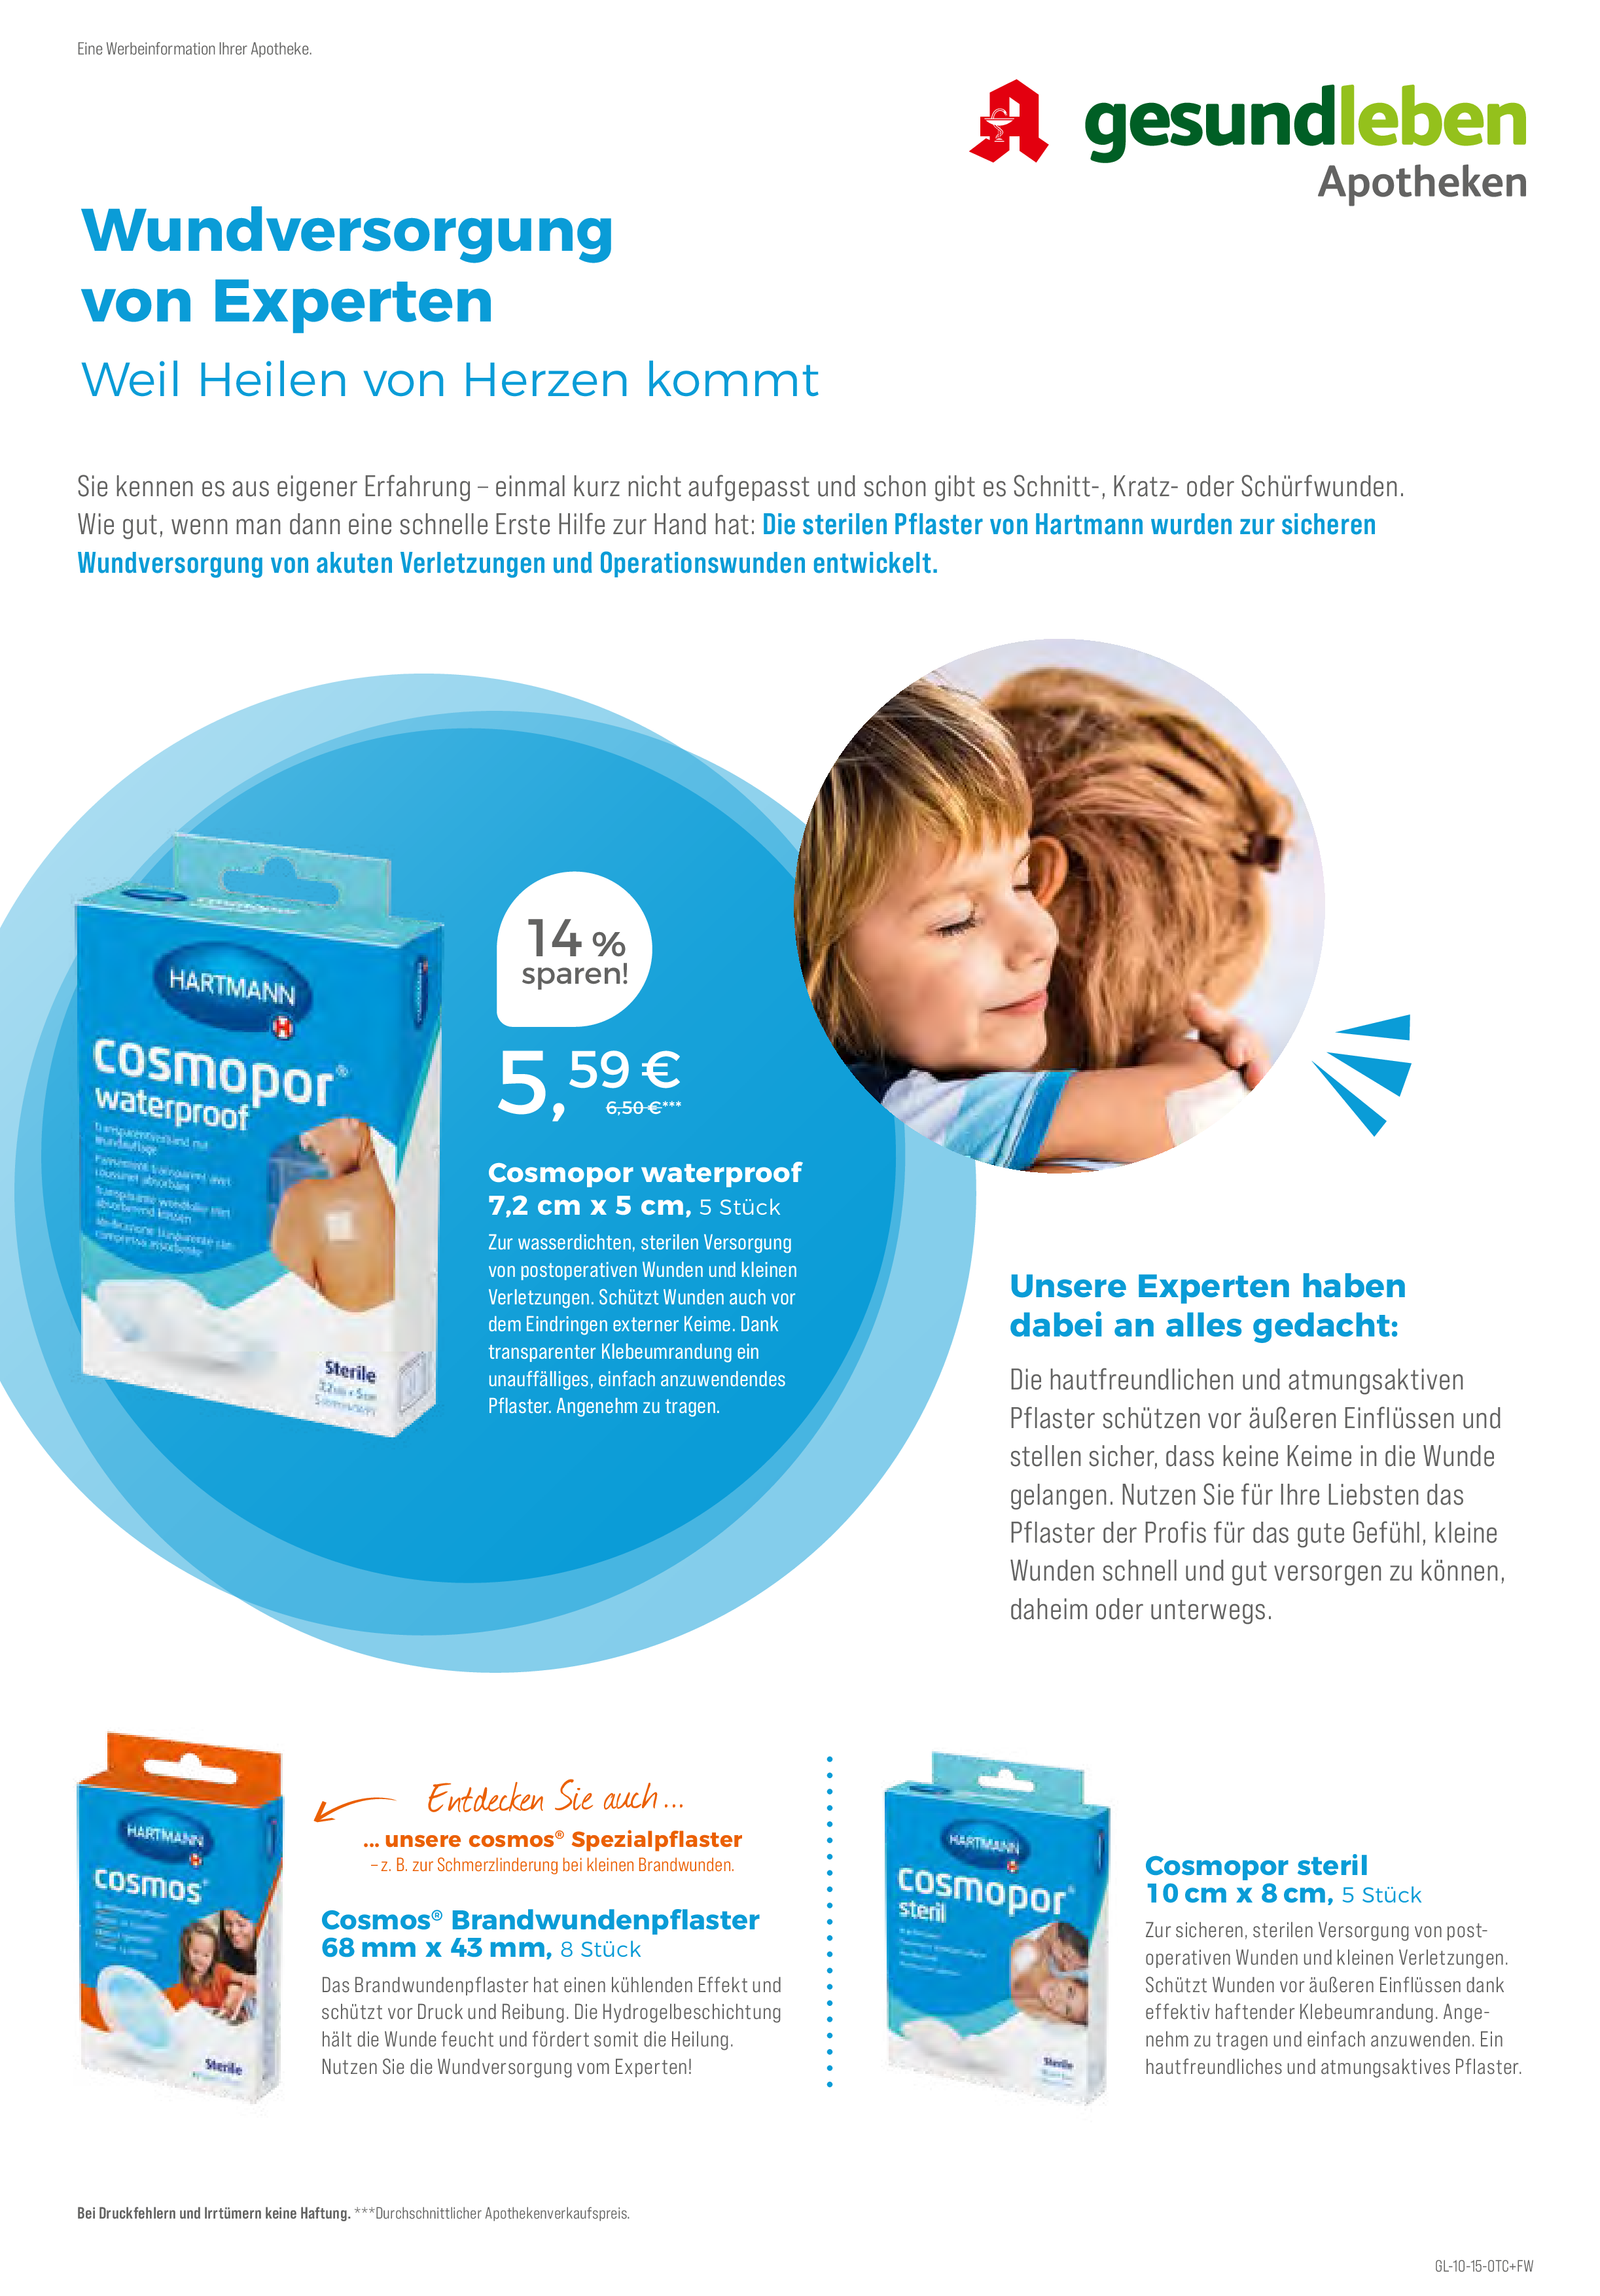 https://mein-uploads.apocdn.net/28462/leaflets/gesundleben_niedrig-Seite5.png